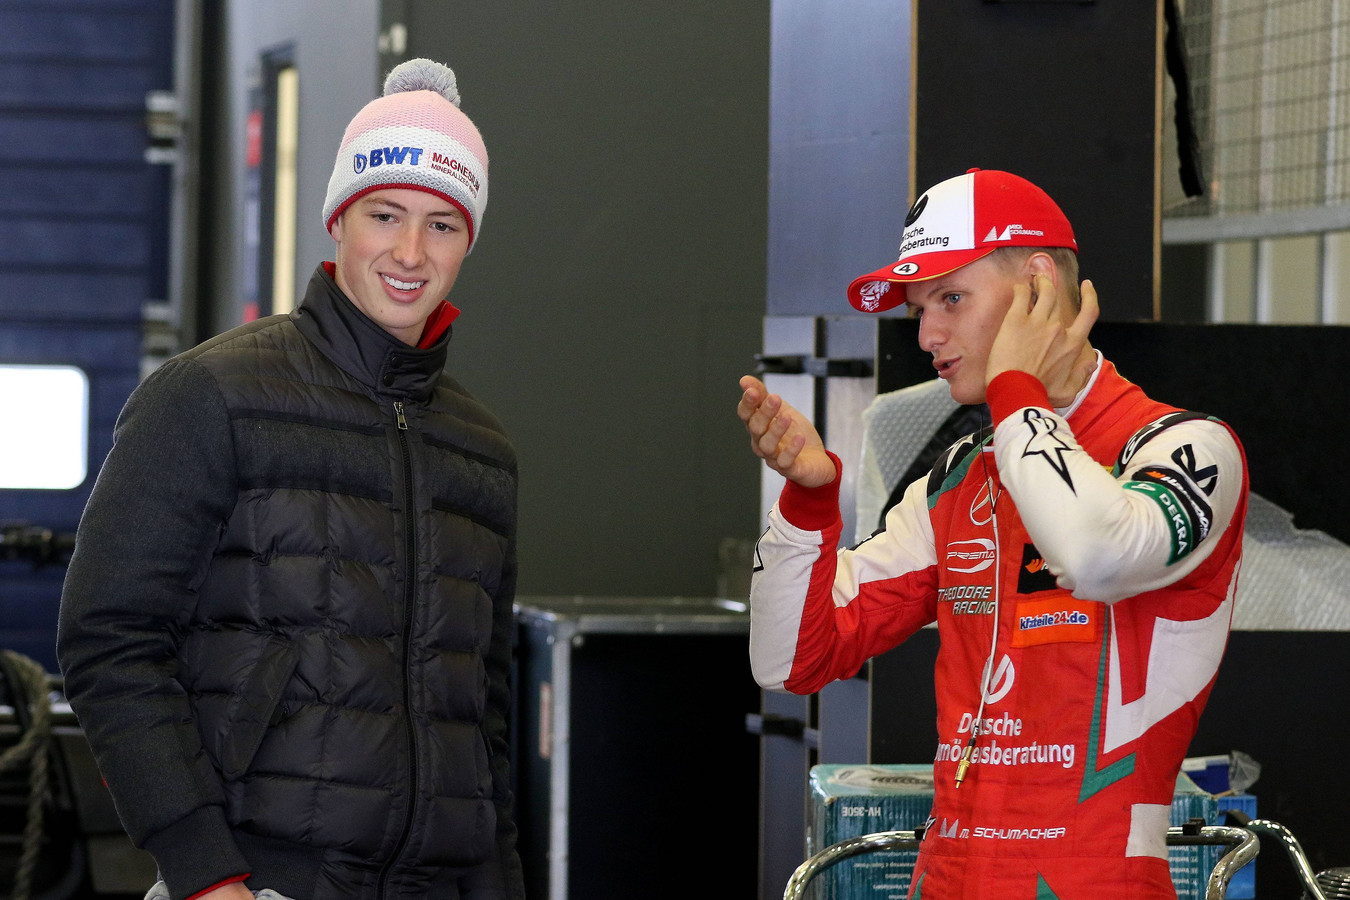 David en Mick Schumacher